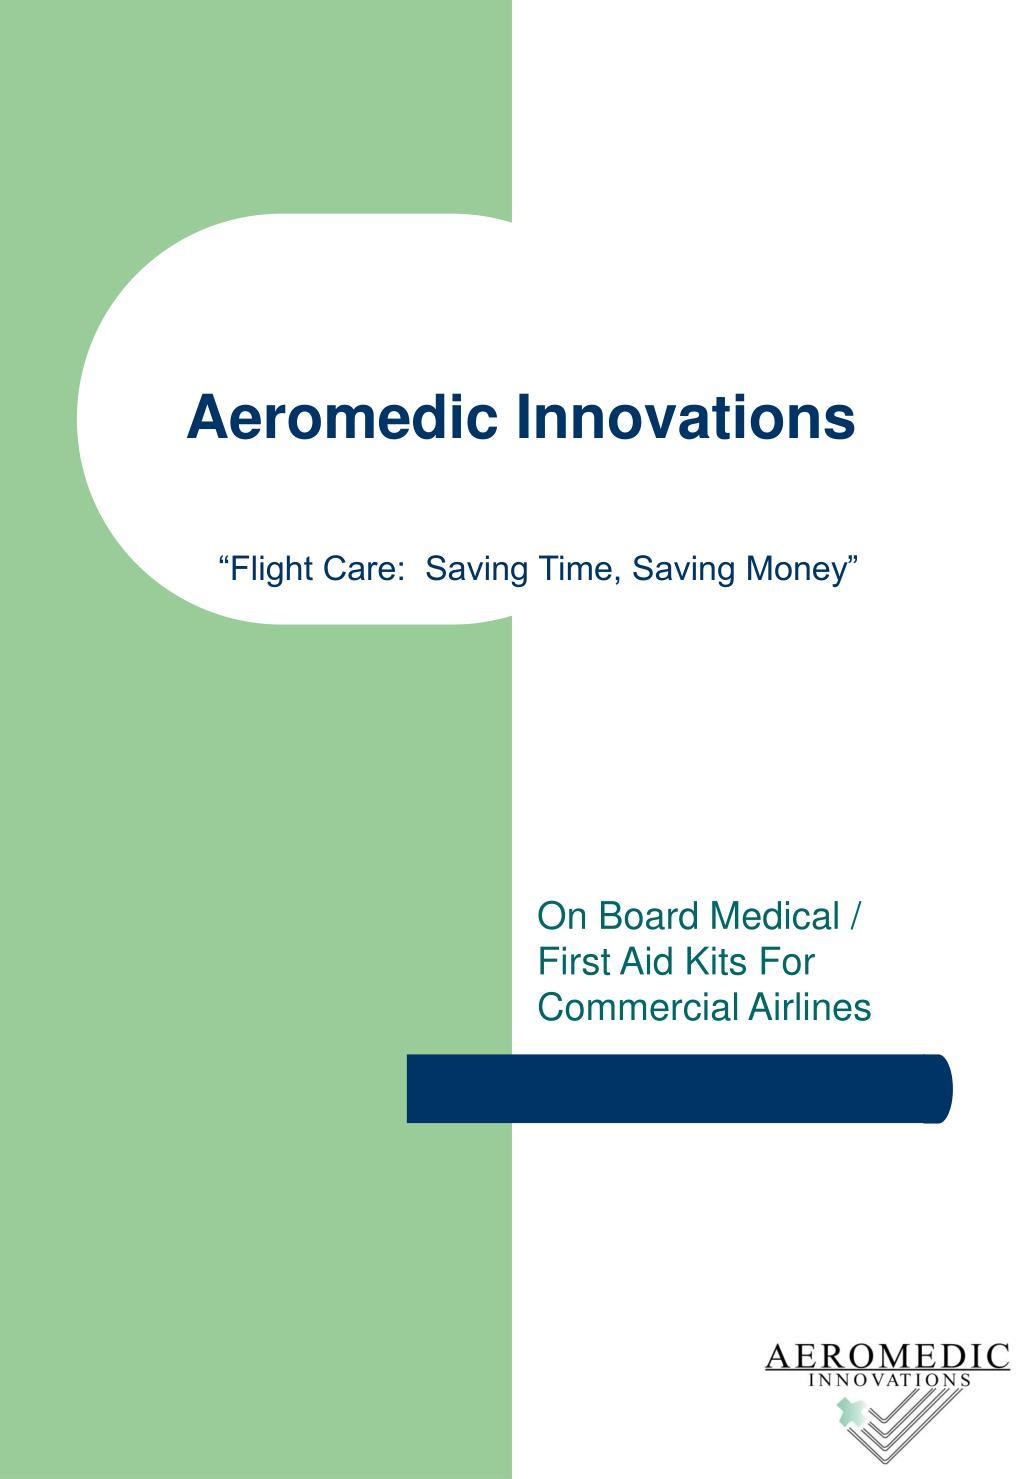 aeromedic innovations l.